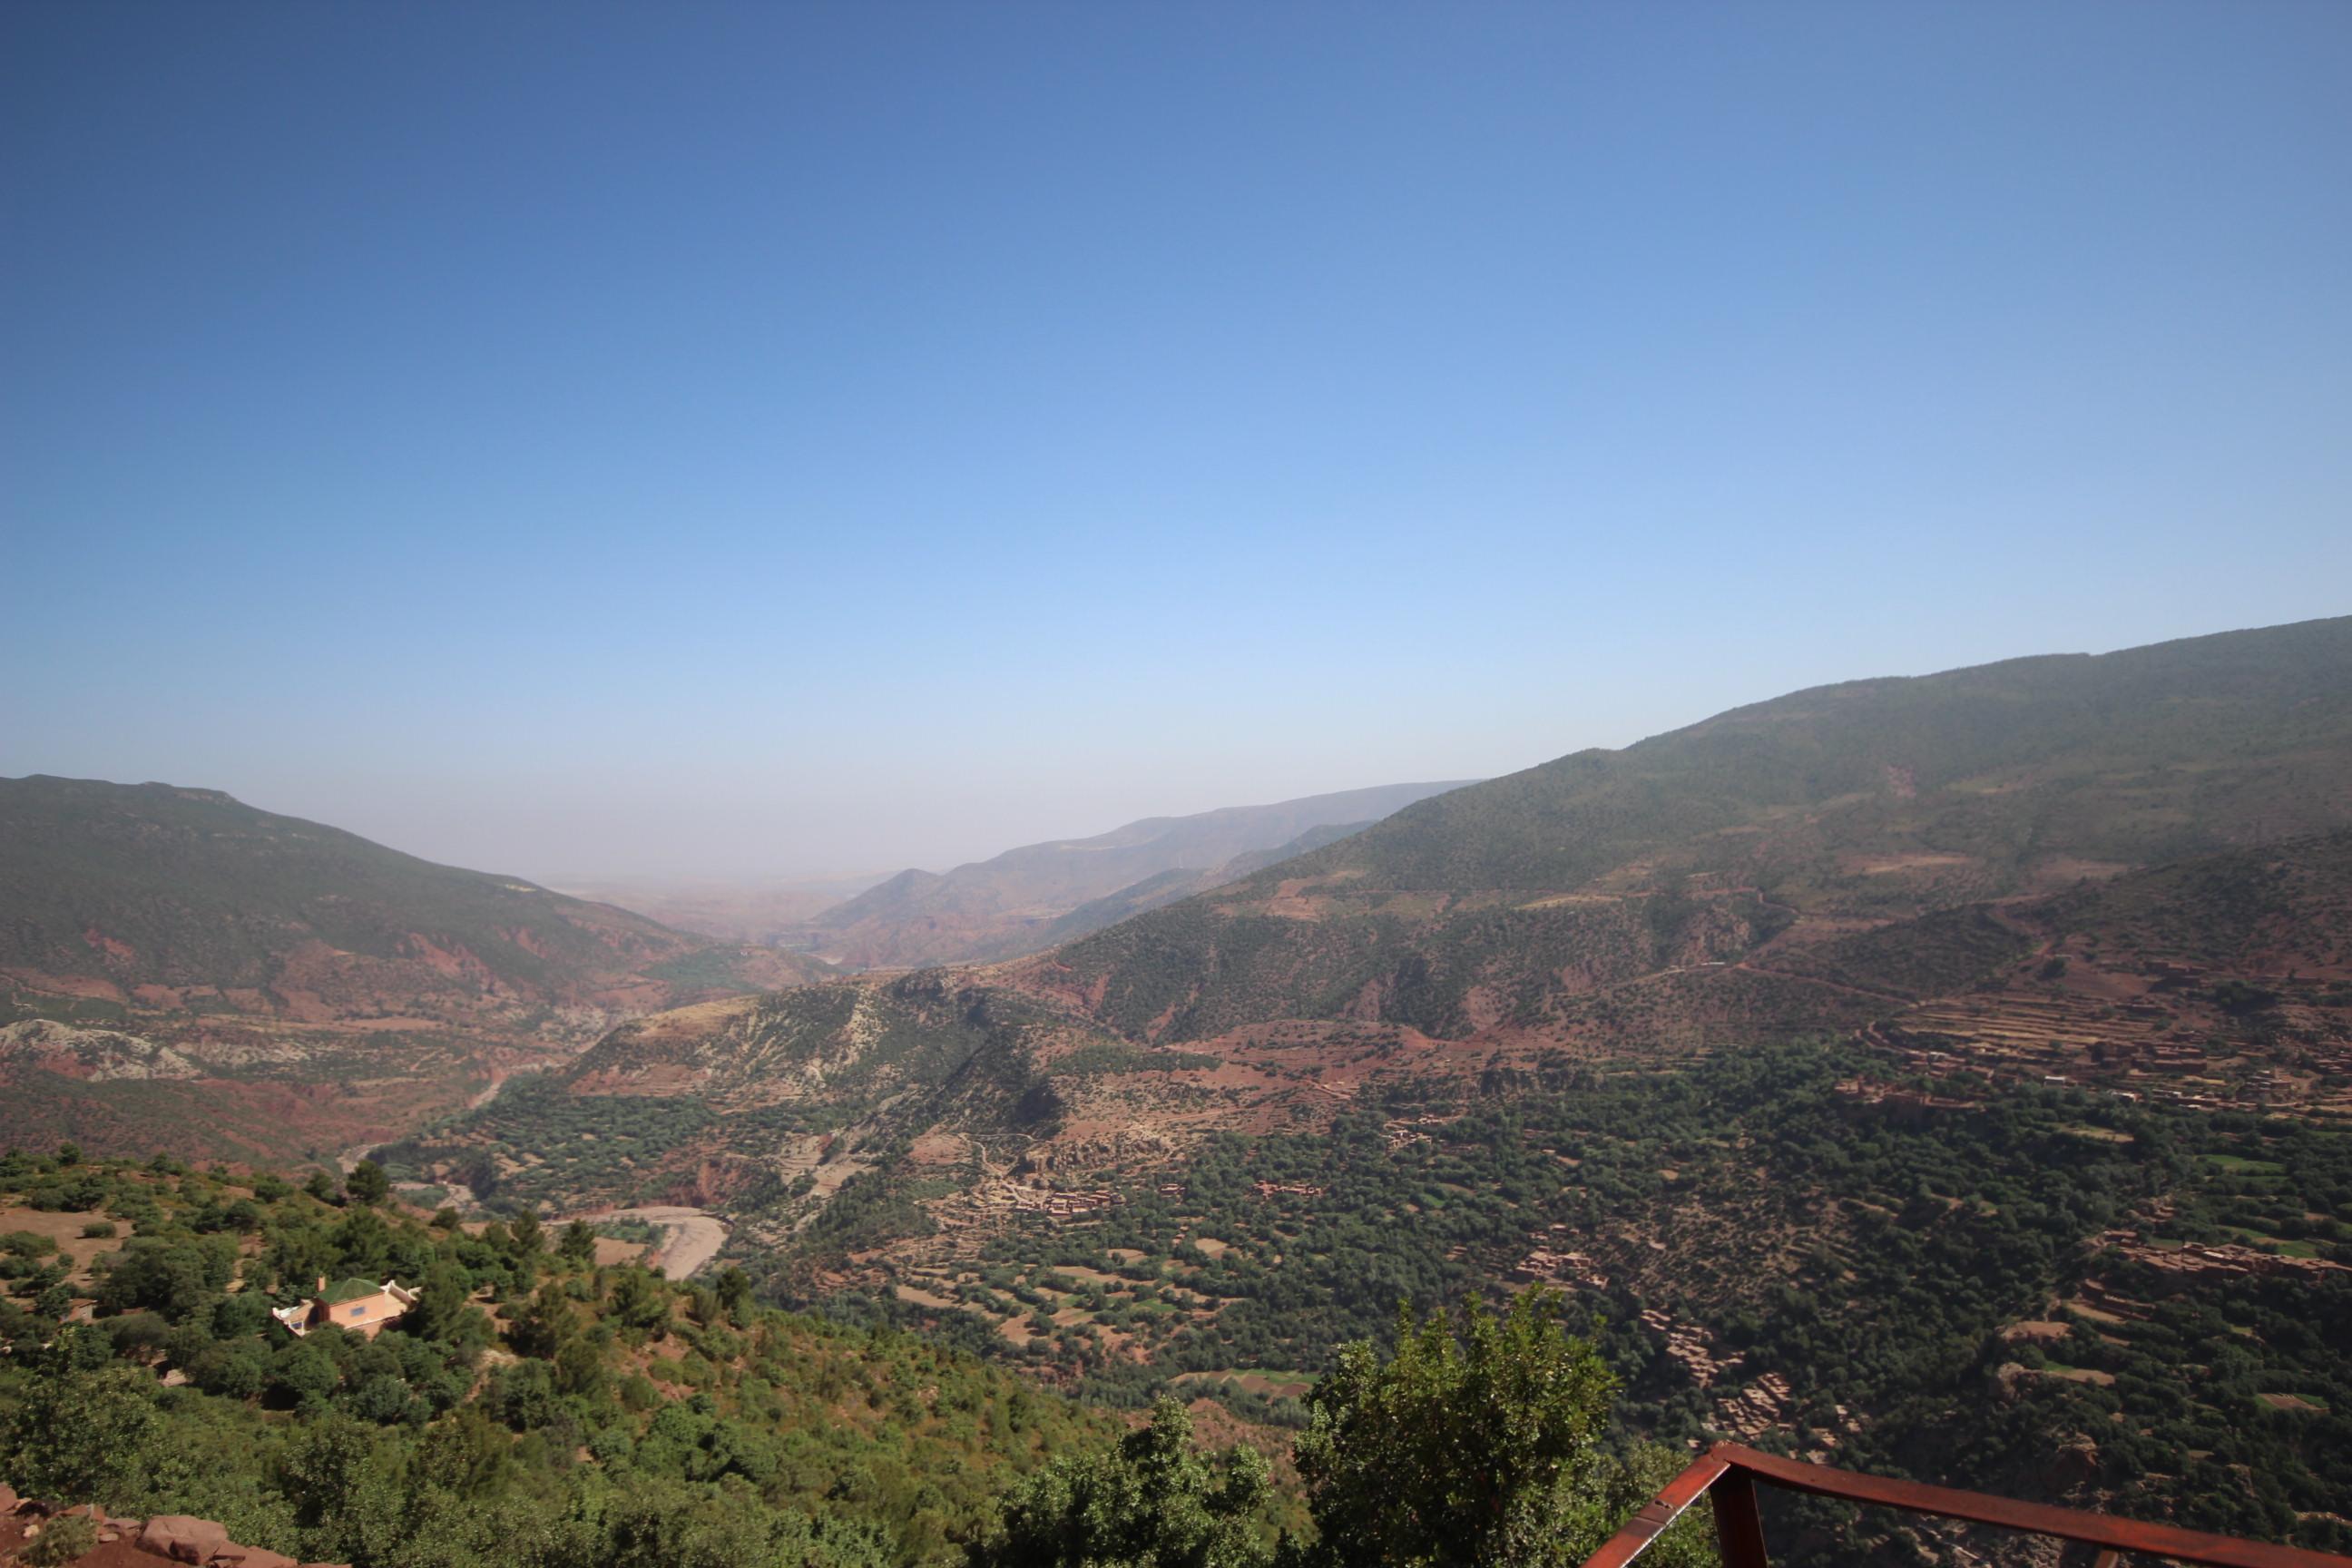 Zwillingsratgeber IMG_5845 Marokko Urlaub - Zwei Frauen unterwegs